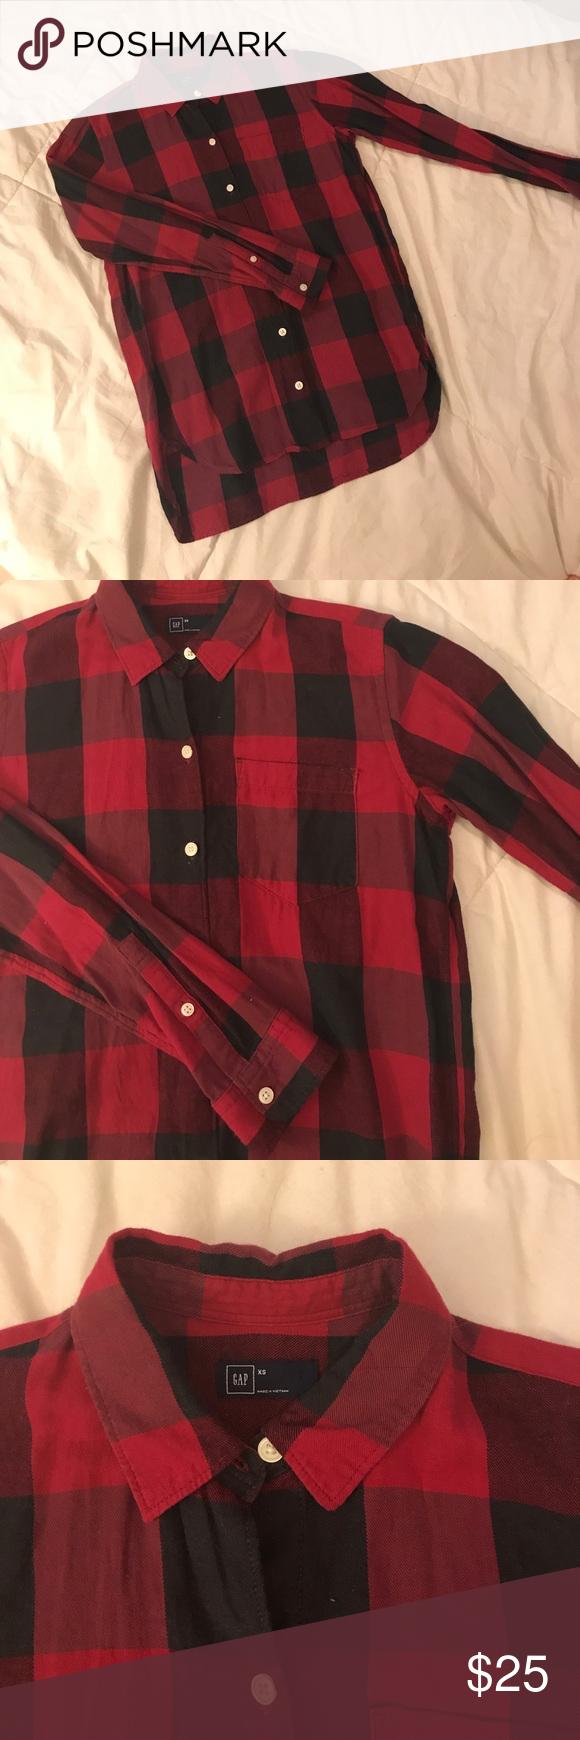 Flannel shirt xs  GAP Flannel shirt  My Posh Picks  Pinterest  Flannel shirts